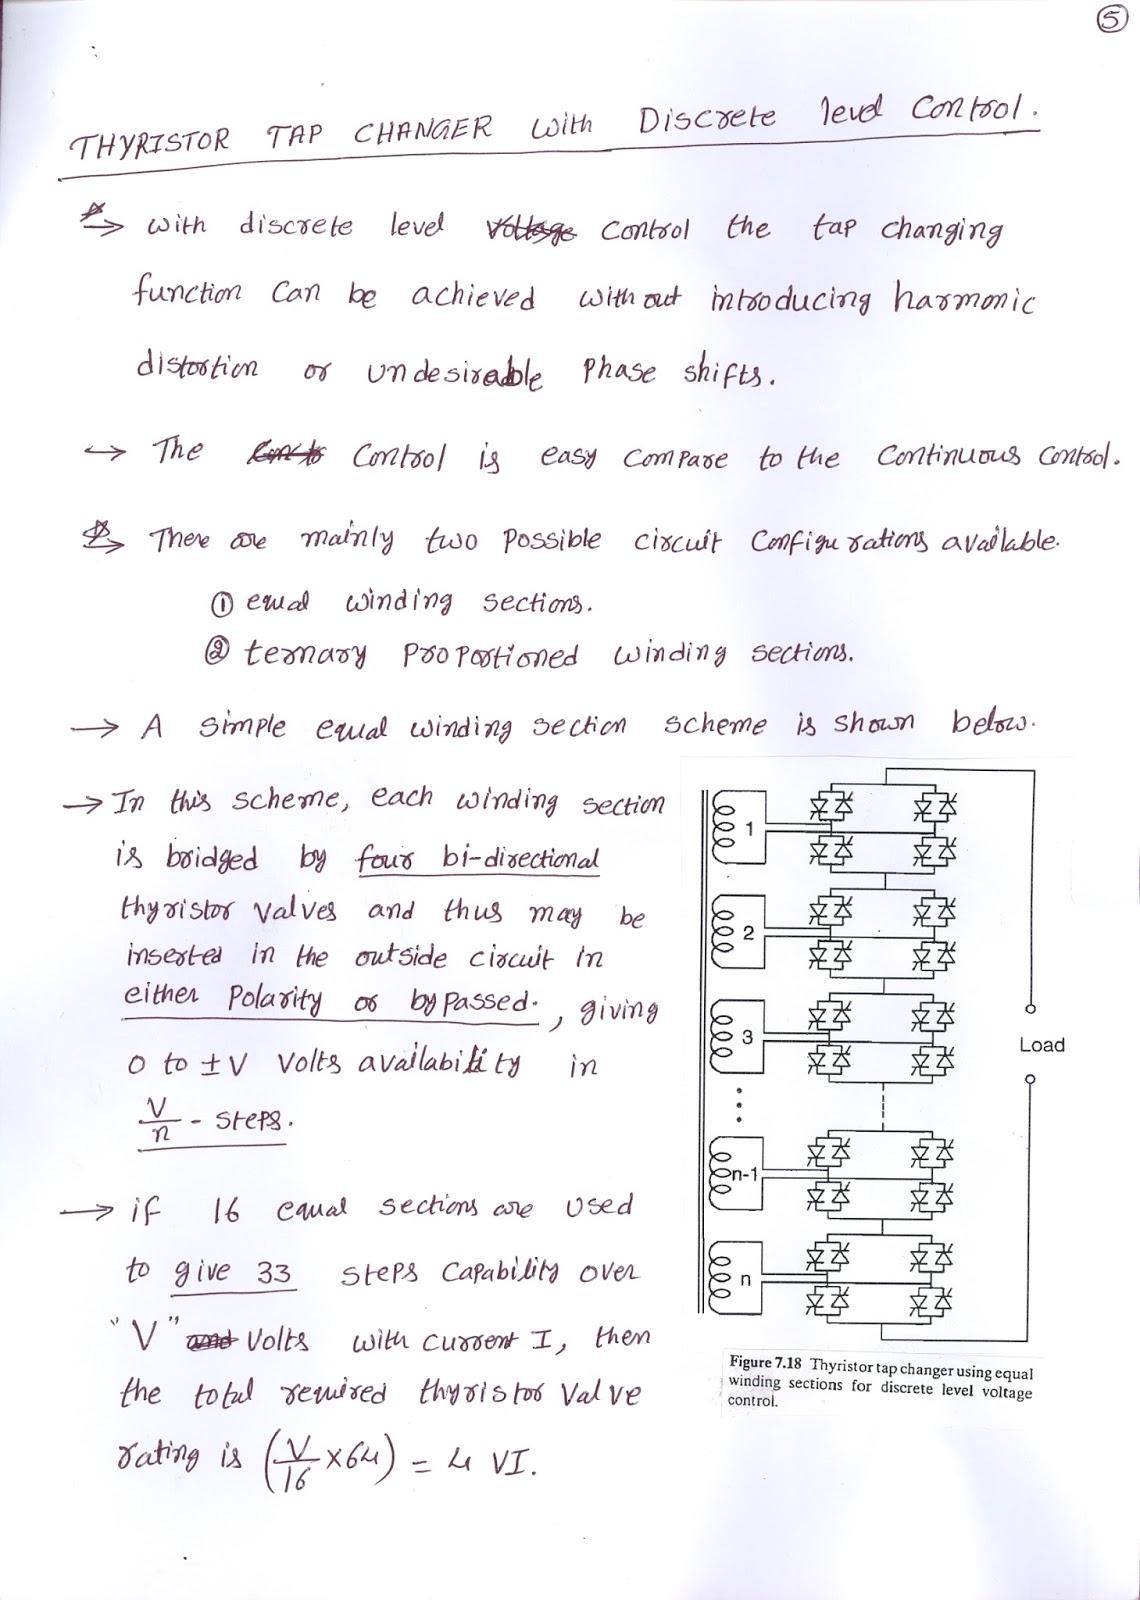 Thyristor Controlled Voltage Regulators And Discrete Regulator Posted 7th July 2015 By Mali S N Krishna Konijeti